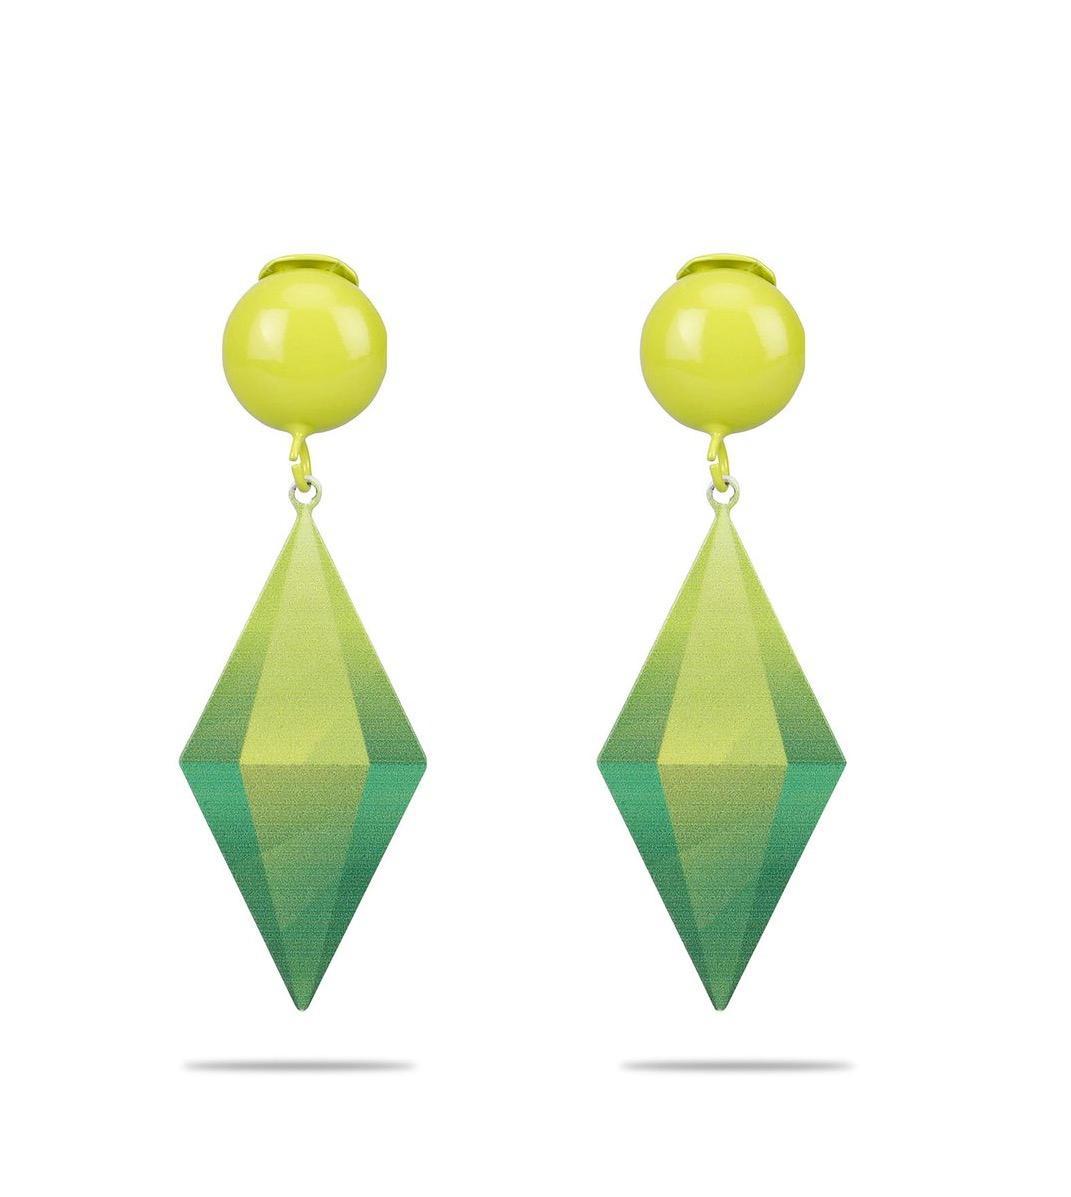 moschino-sims-earrings-1555004022385.jpg